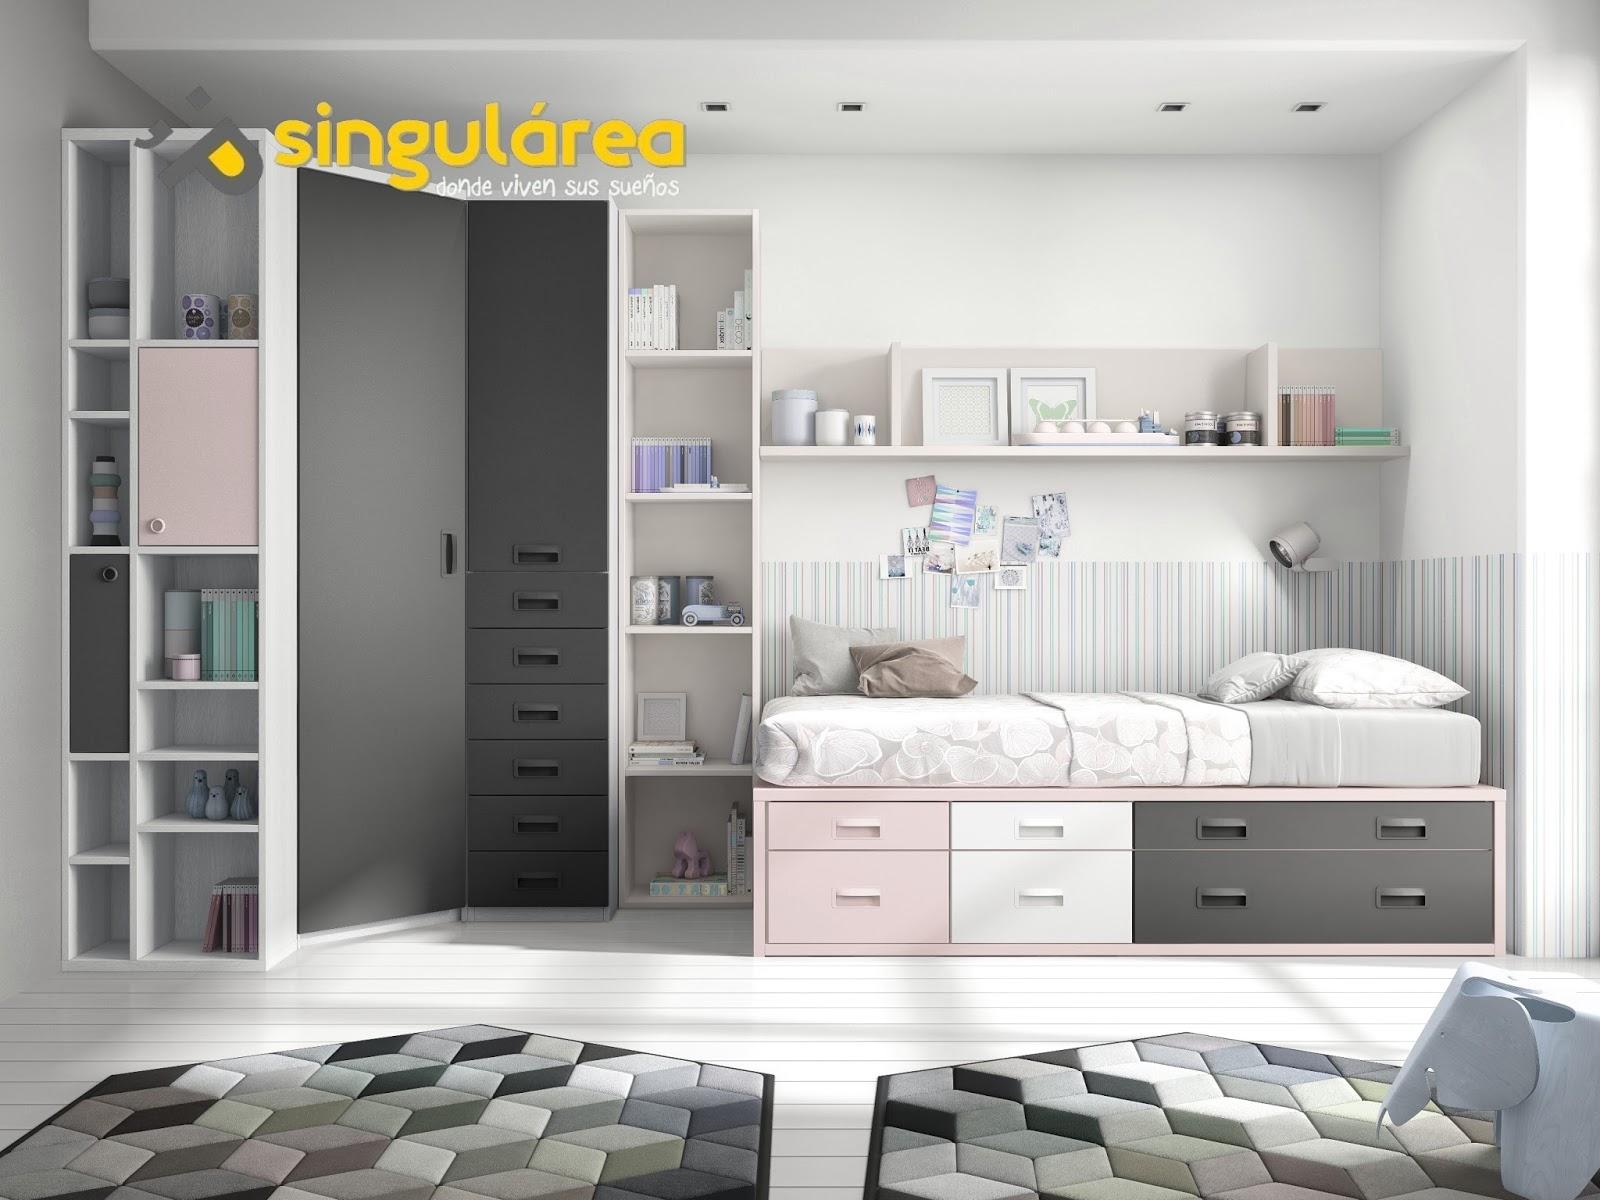 Accesorios Para Dormitorios Juveniles - Diseños Arquitectónicos ...